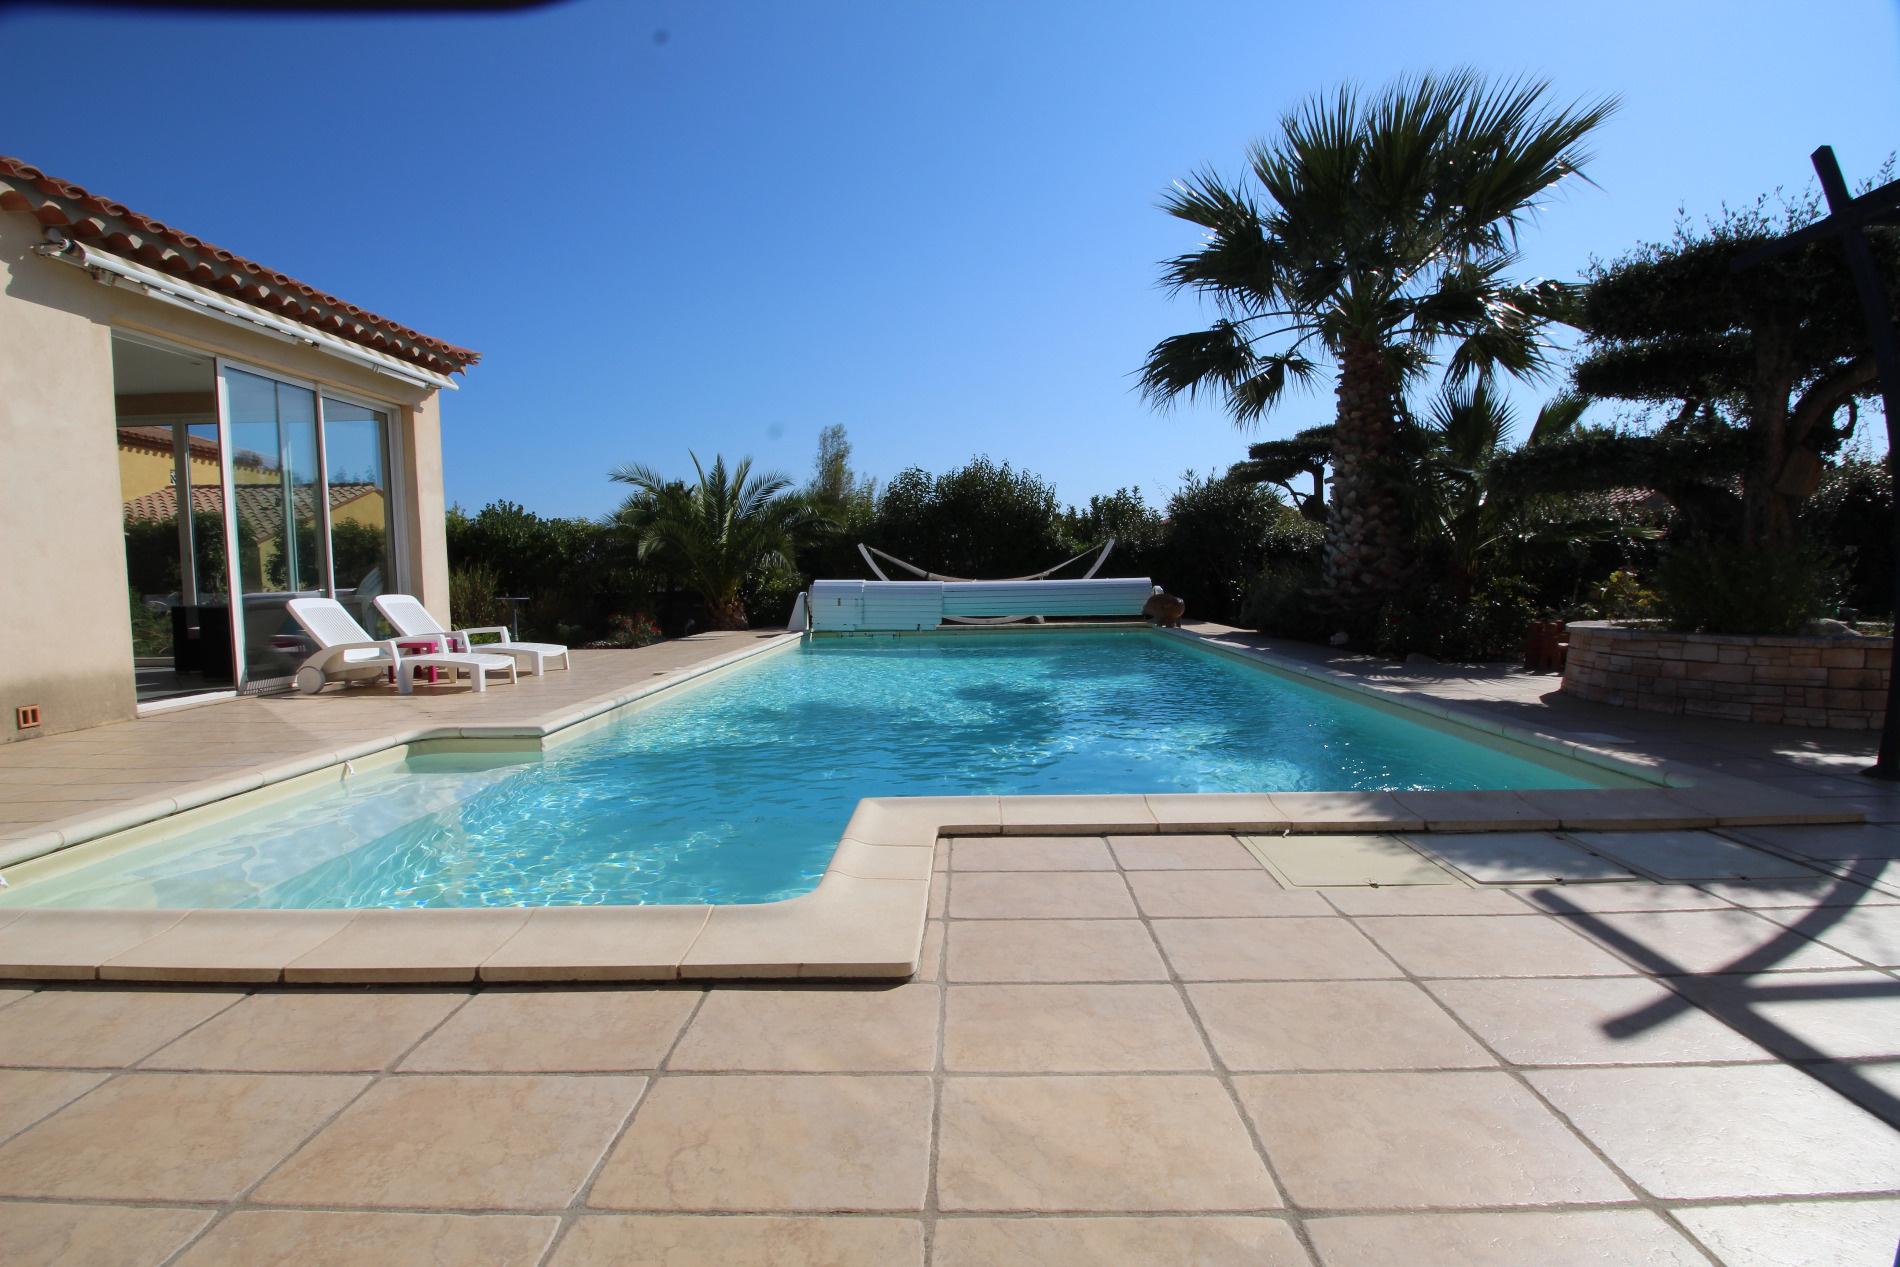 Secteur perpignan sud propri t de standing - Couverture piscine tendue perpignan ...